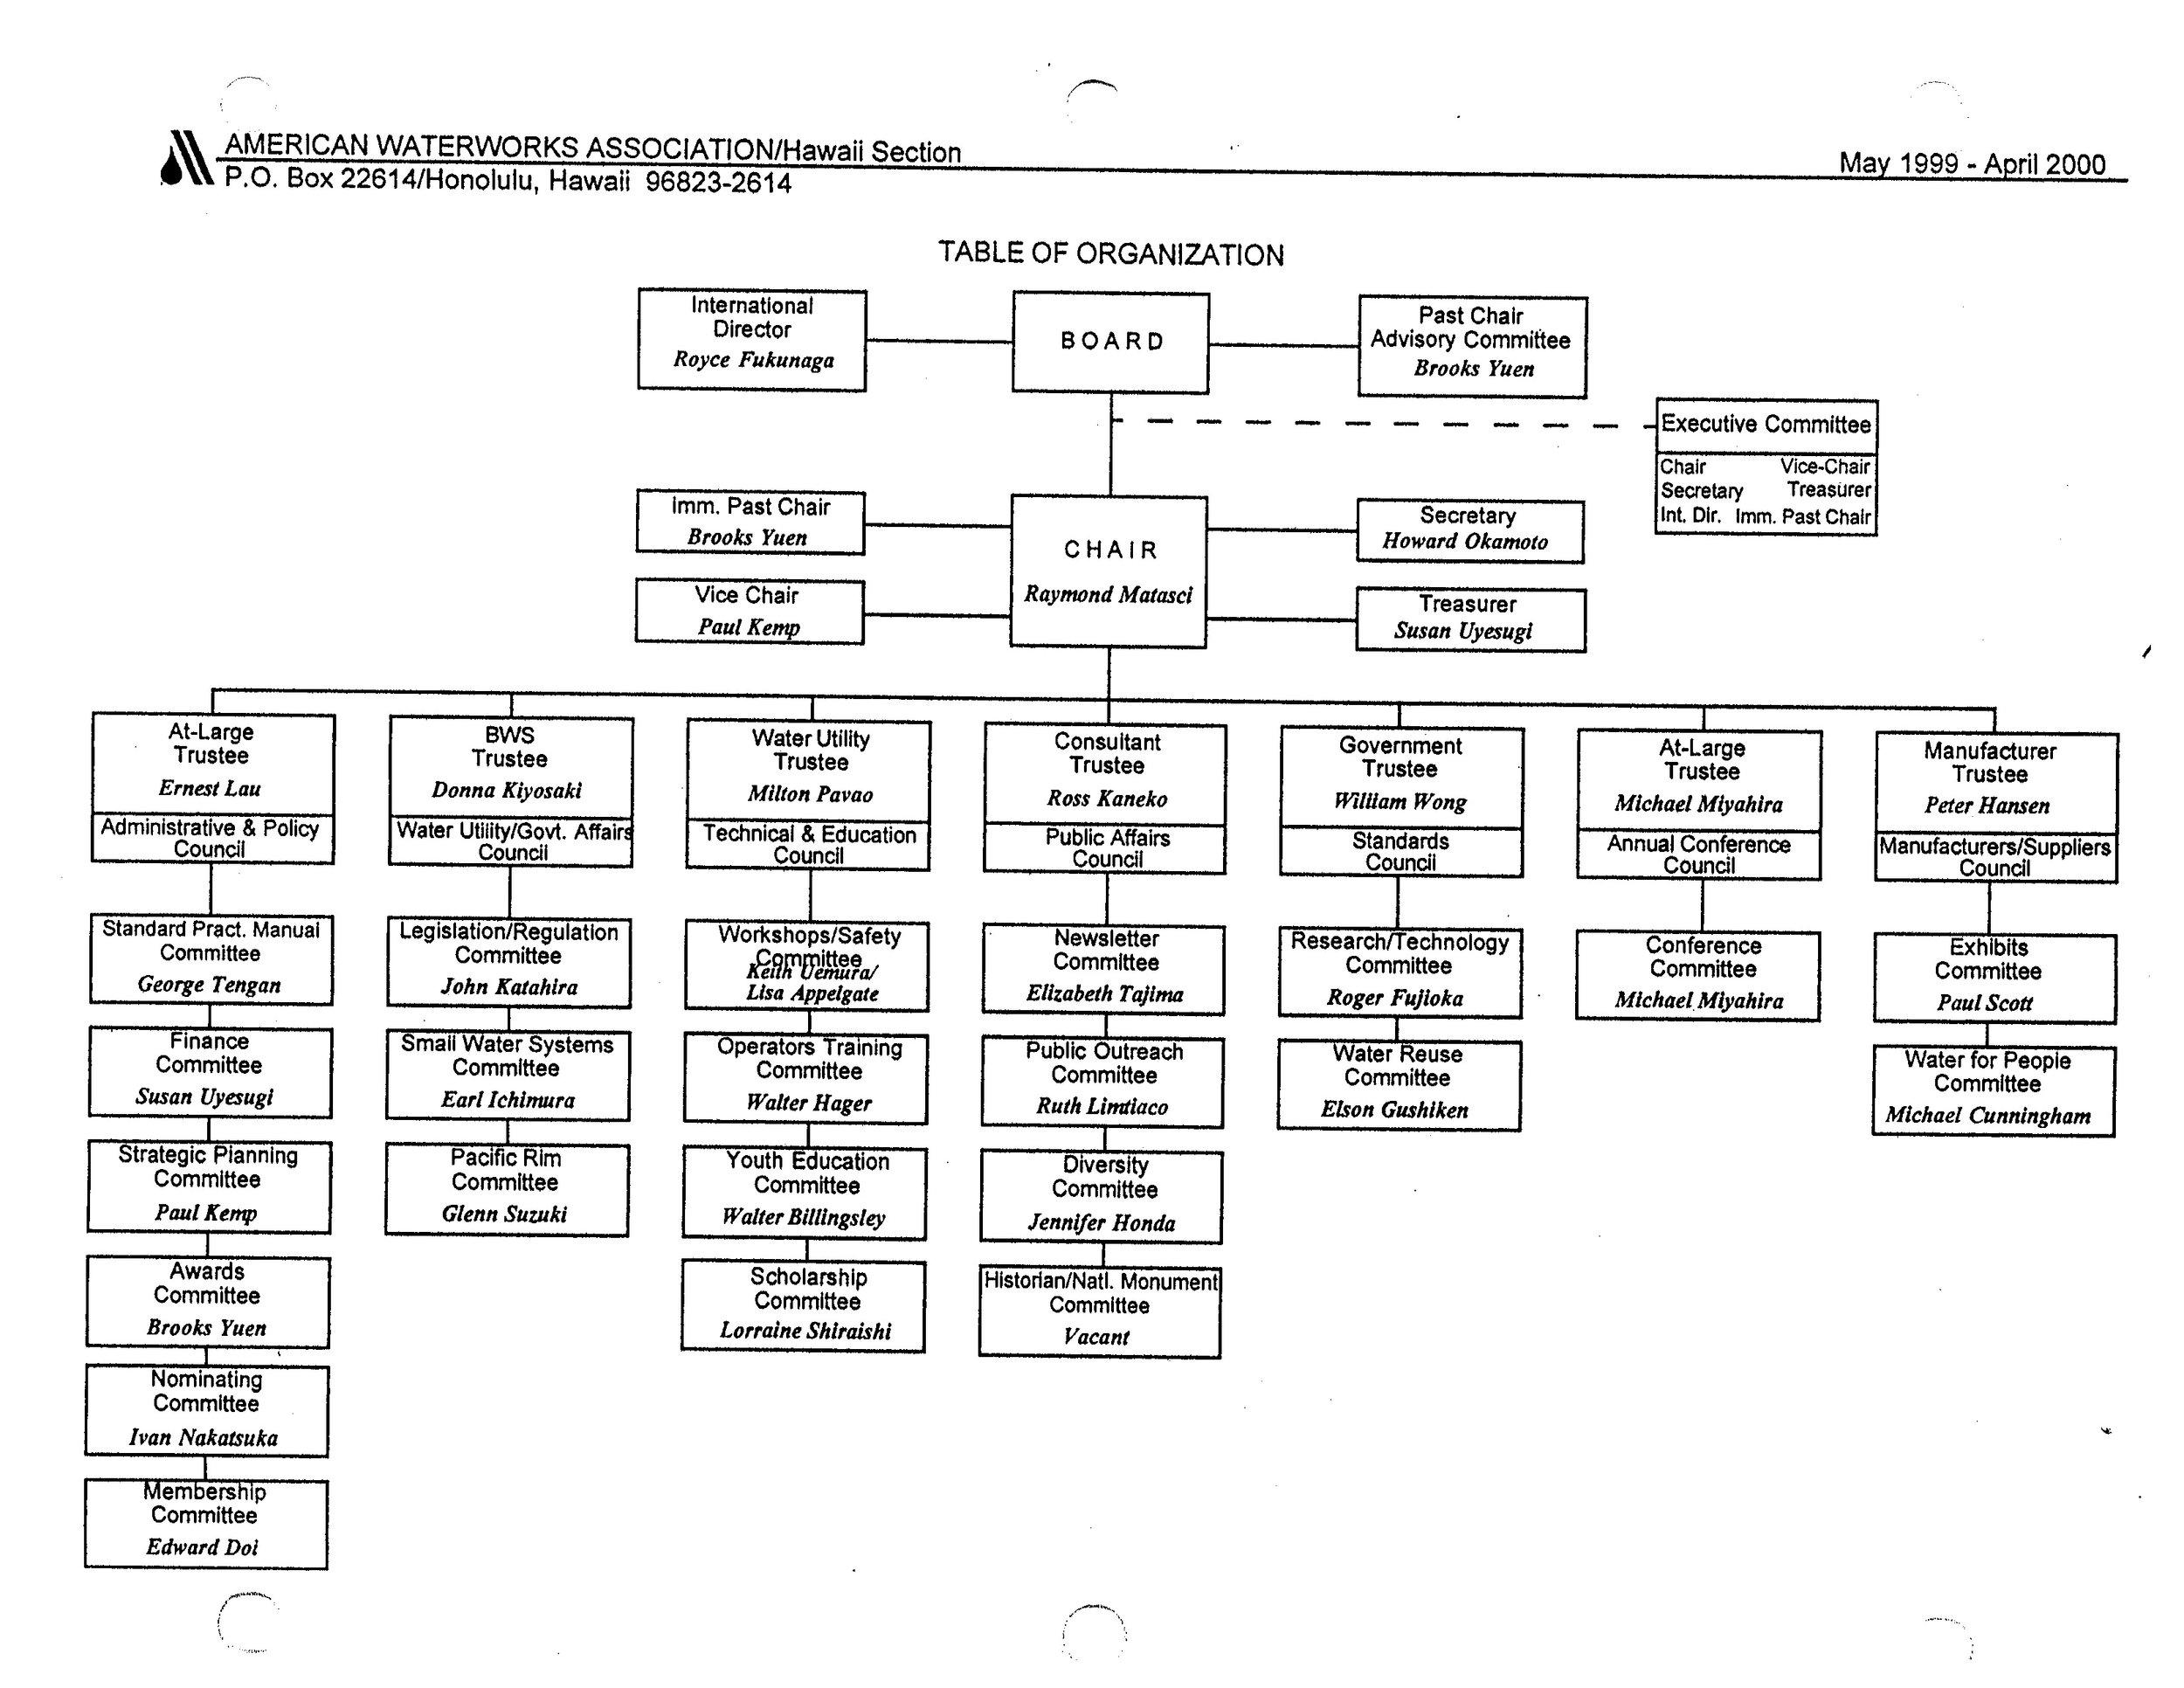 1999-2000.OrgChart.jpg